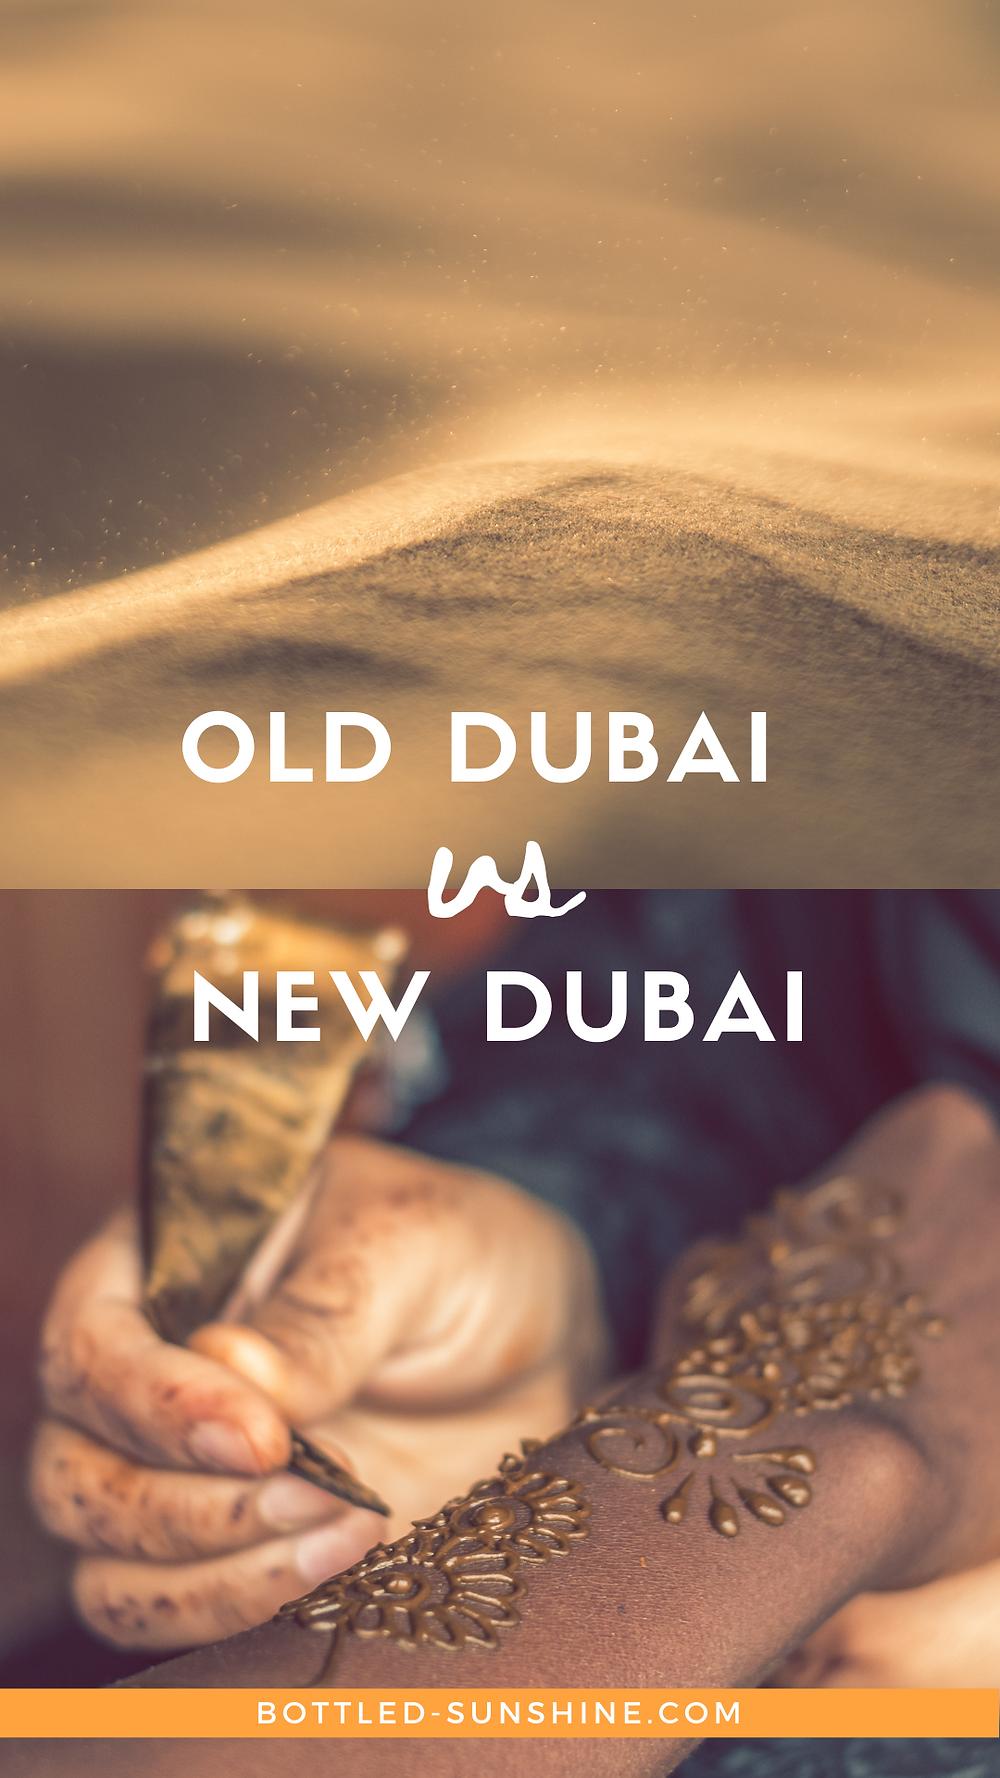 Old Dubai vs New Dubai